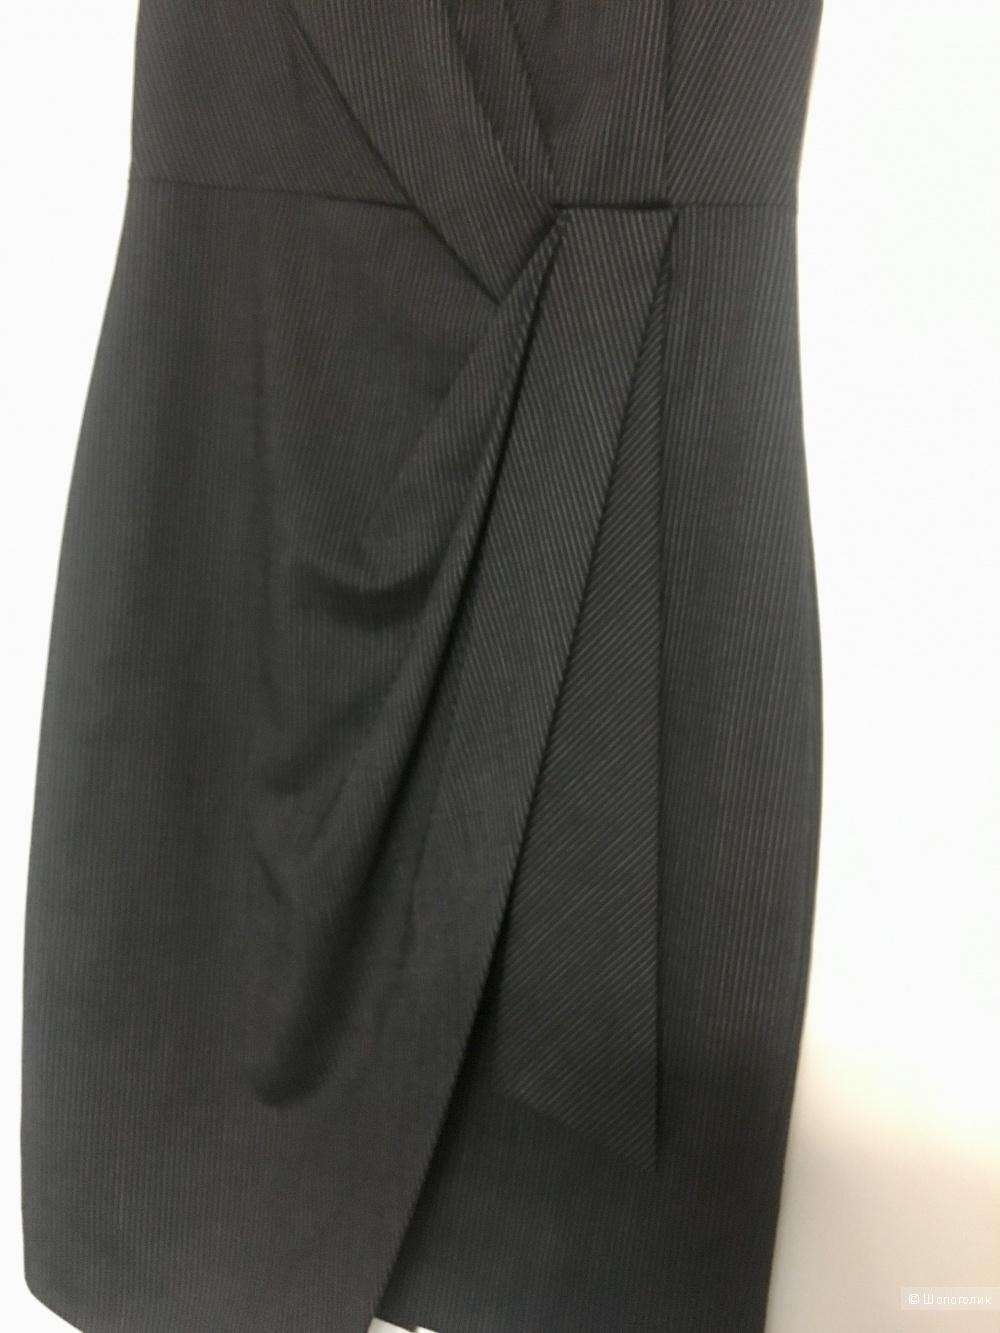 Платье Paul Smith размер 40-42